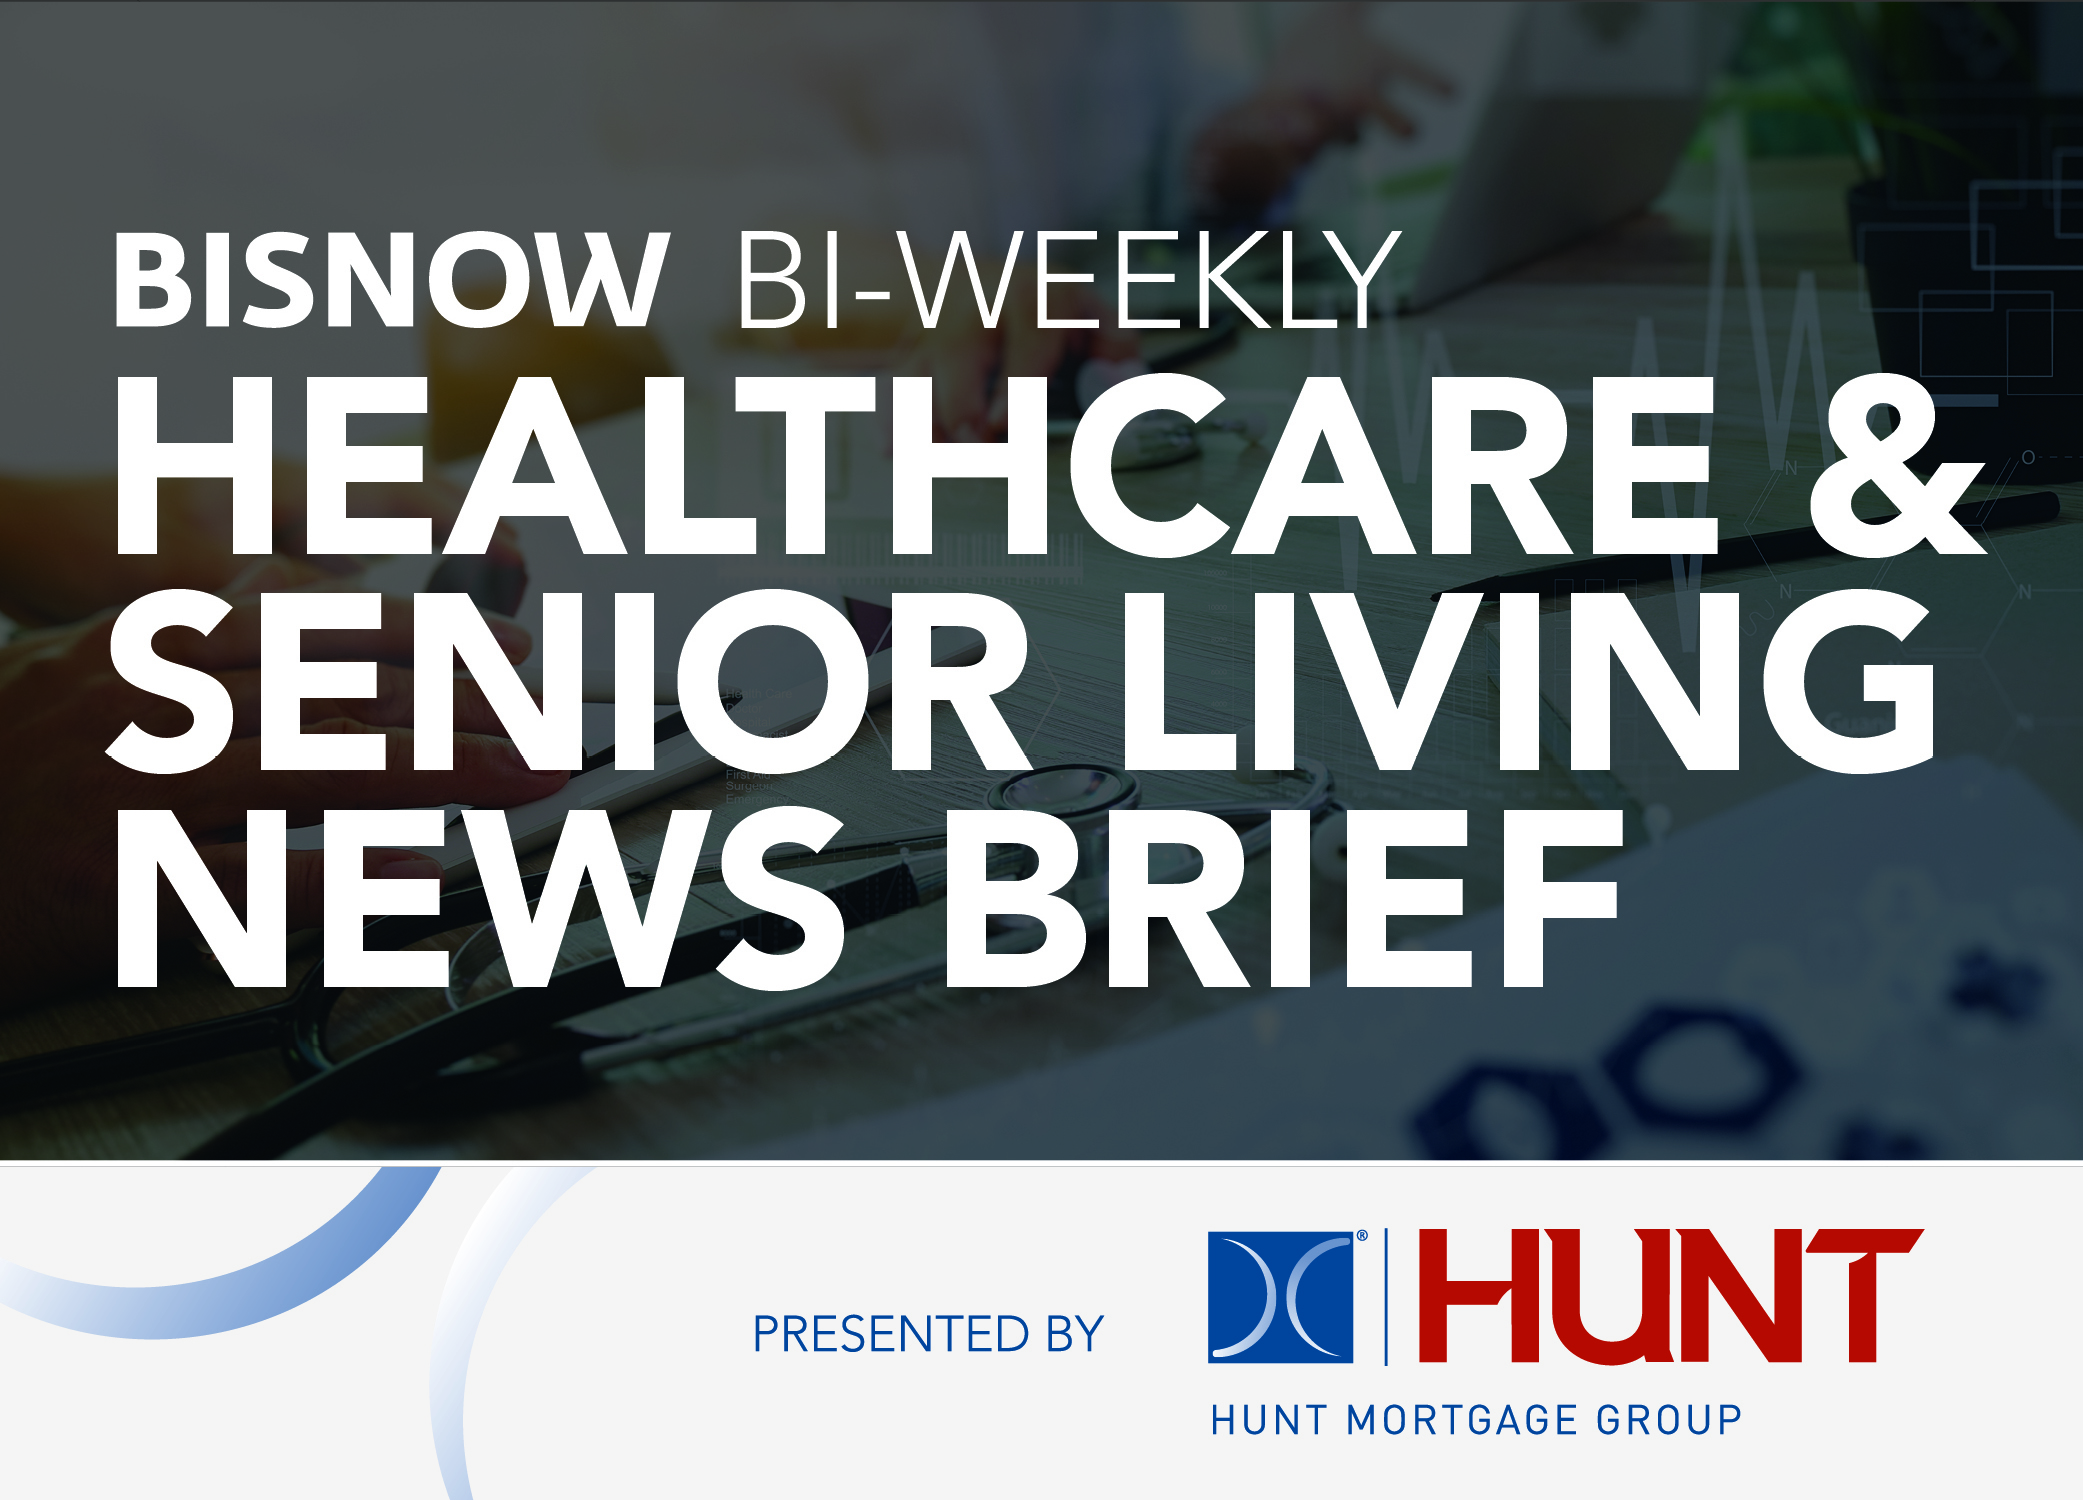 Bisnow Morning Brief Healthcare & Senior Living WEEKLY BRIEF [National]